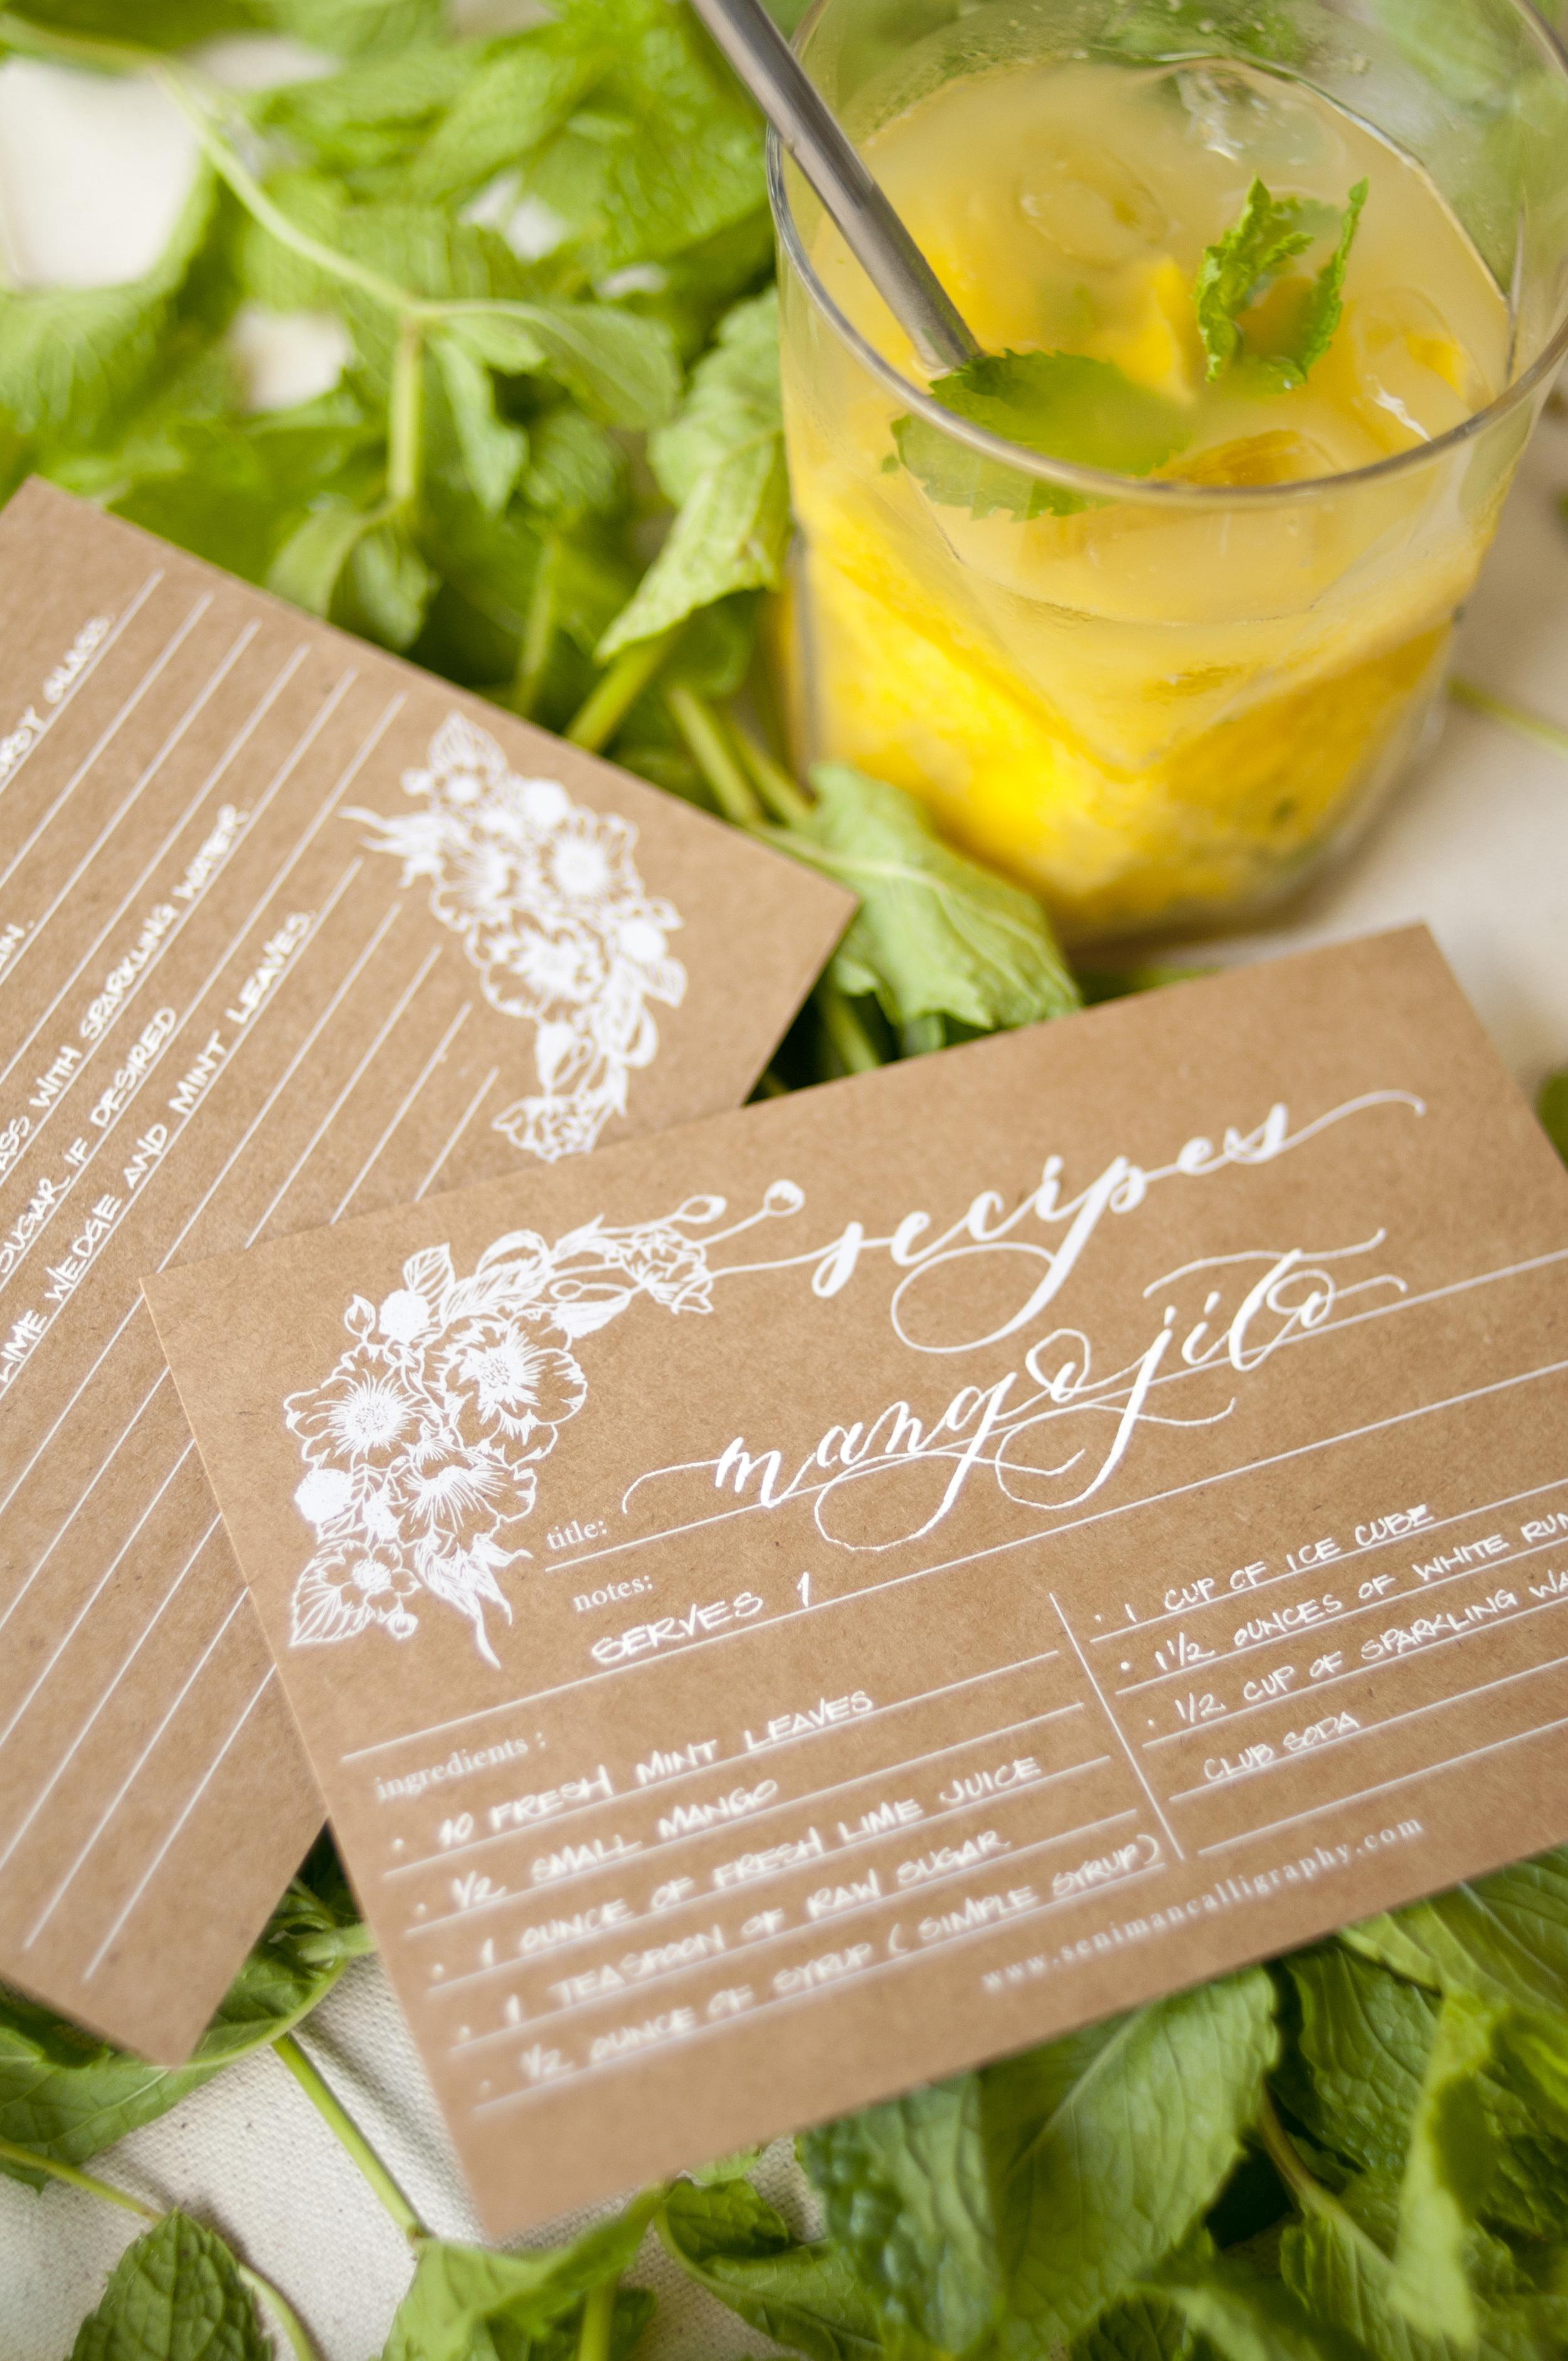 seniman calligraphy kraft and white ink recipe cards_11.JPG